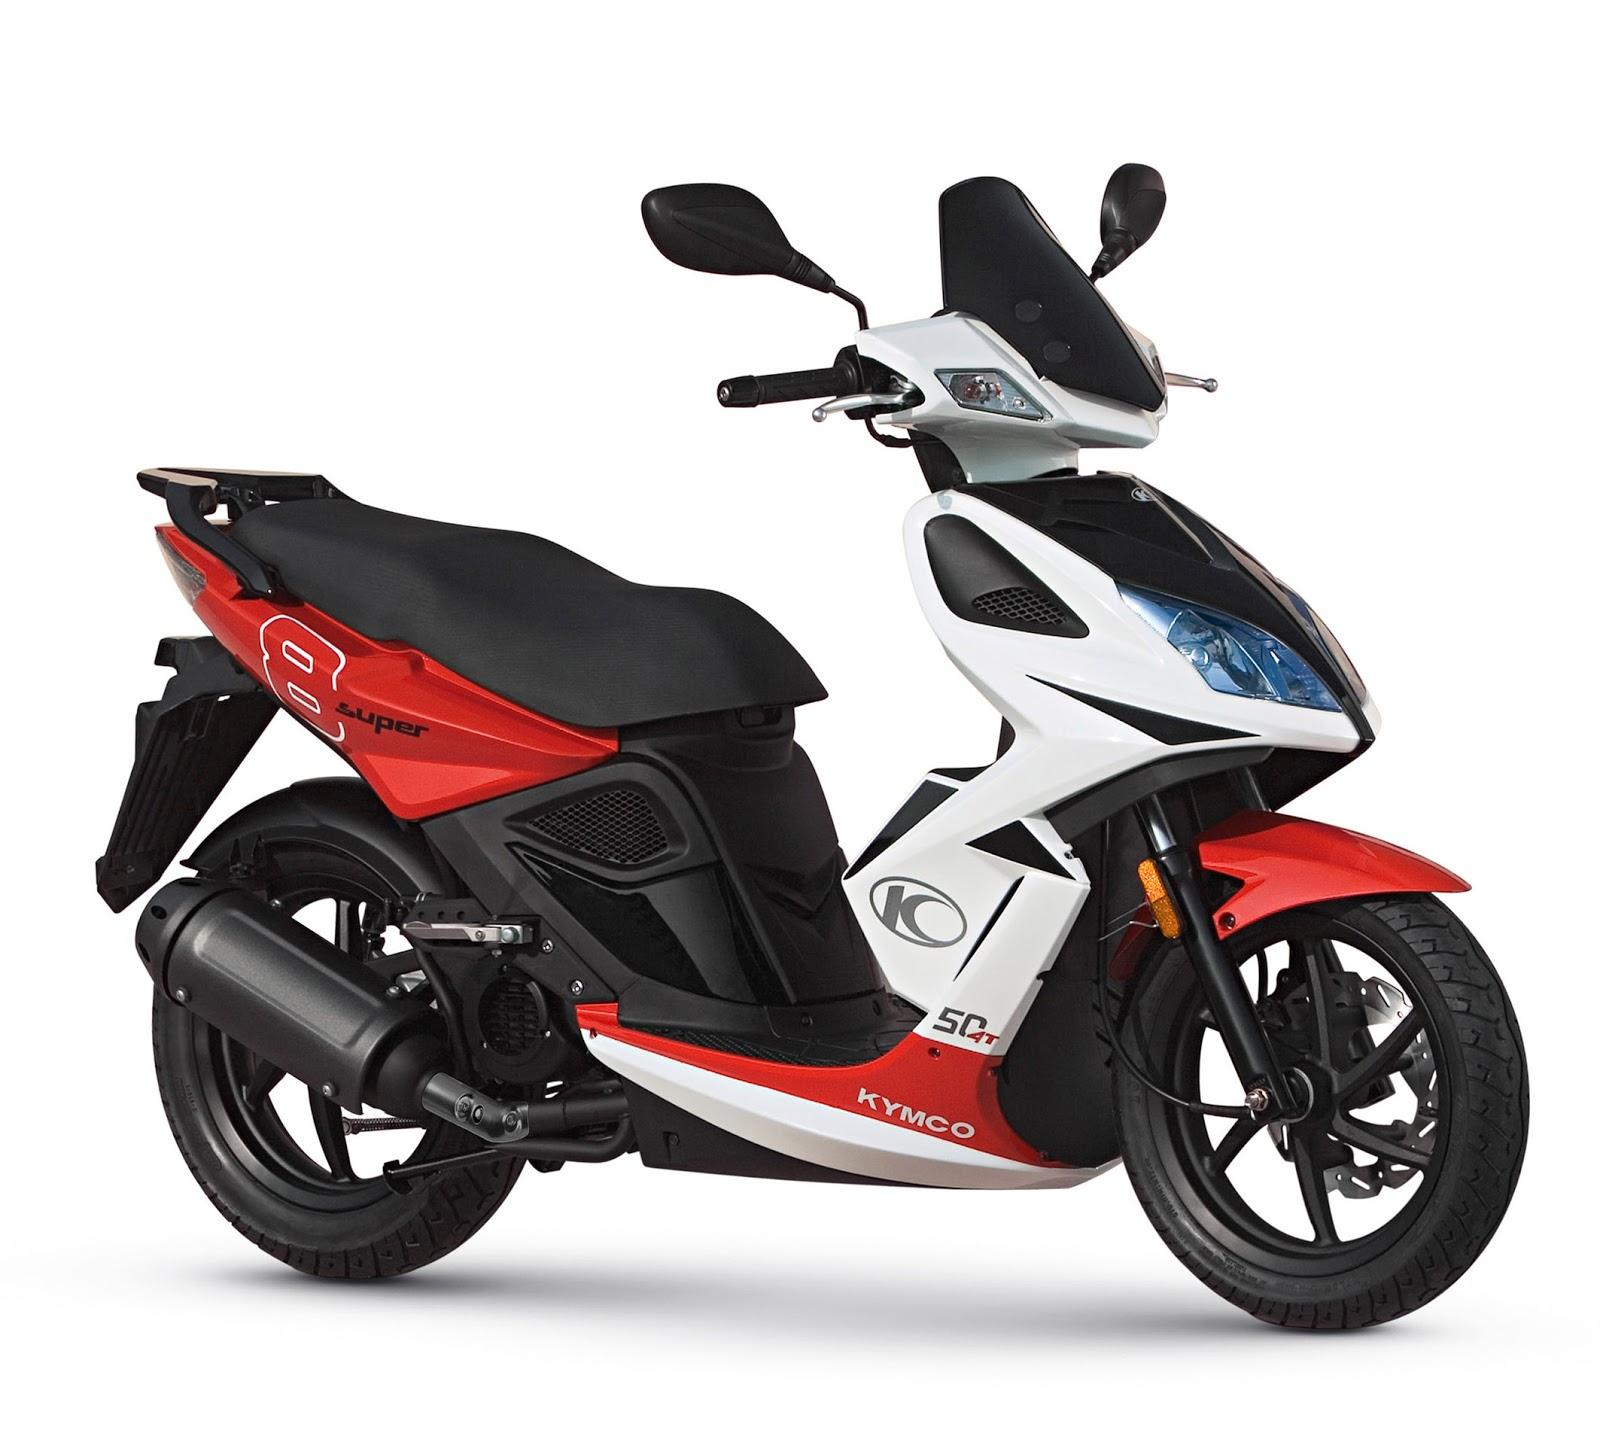 top 5 best chinese scooter motor brands 2013 i scooter motor. Black Bedroom Furniture Sets. Home Design Ideas